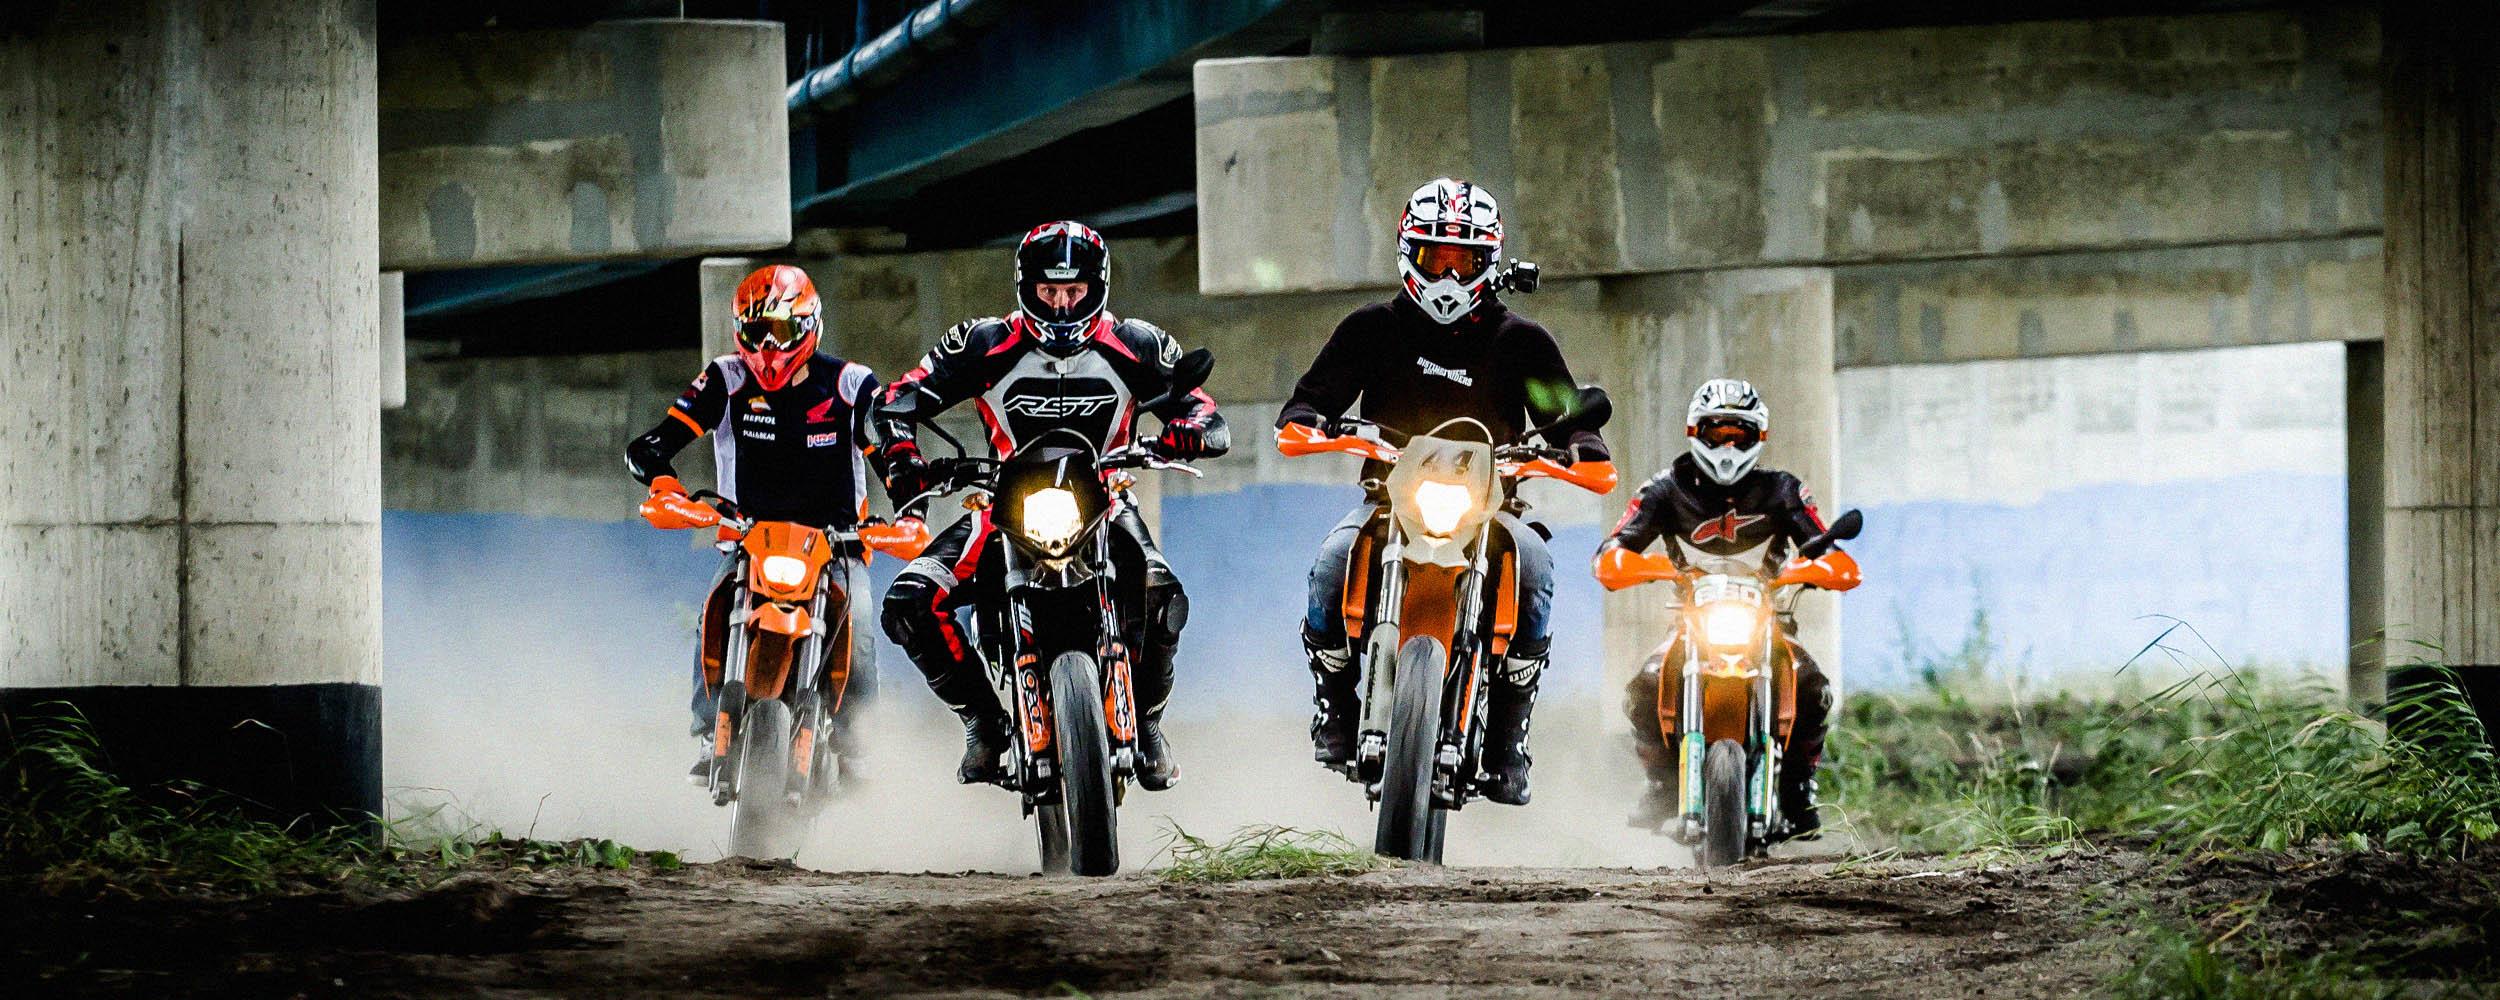 banner-distinct-riders1